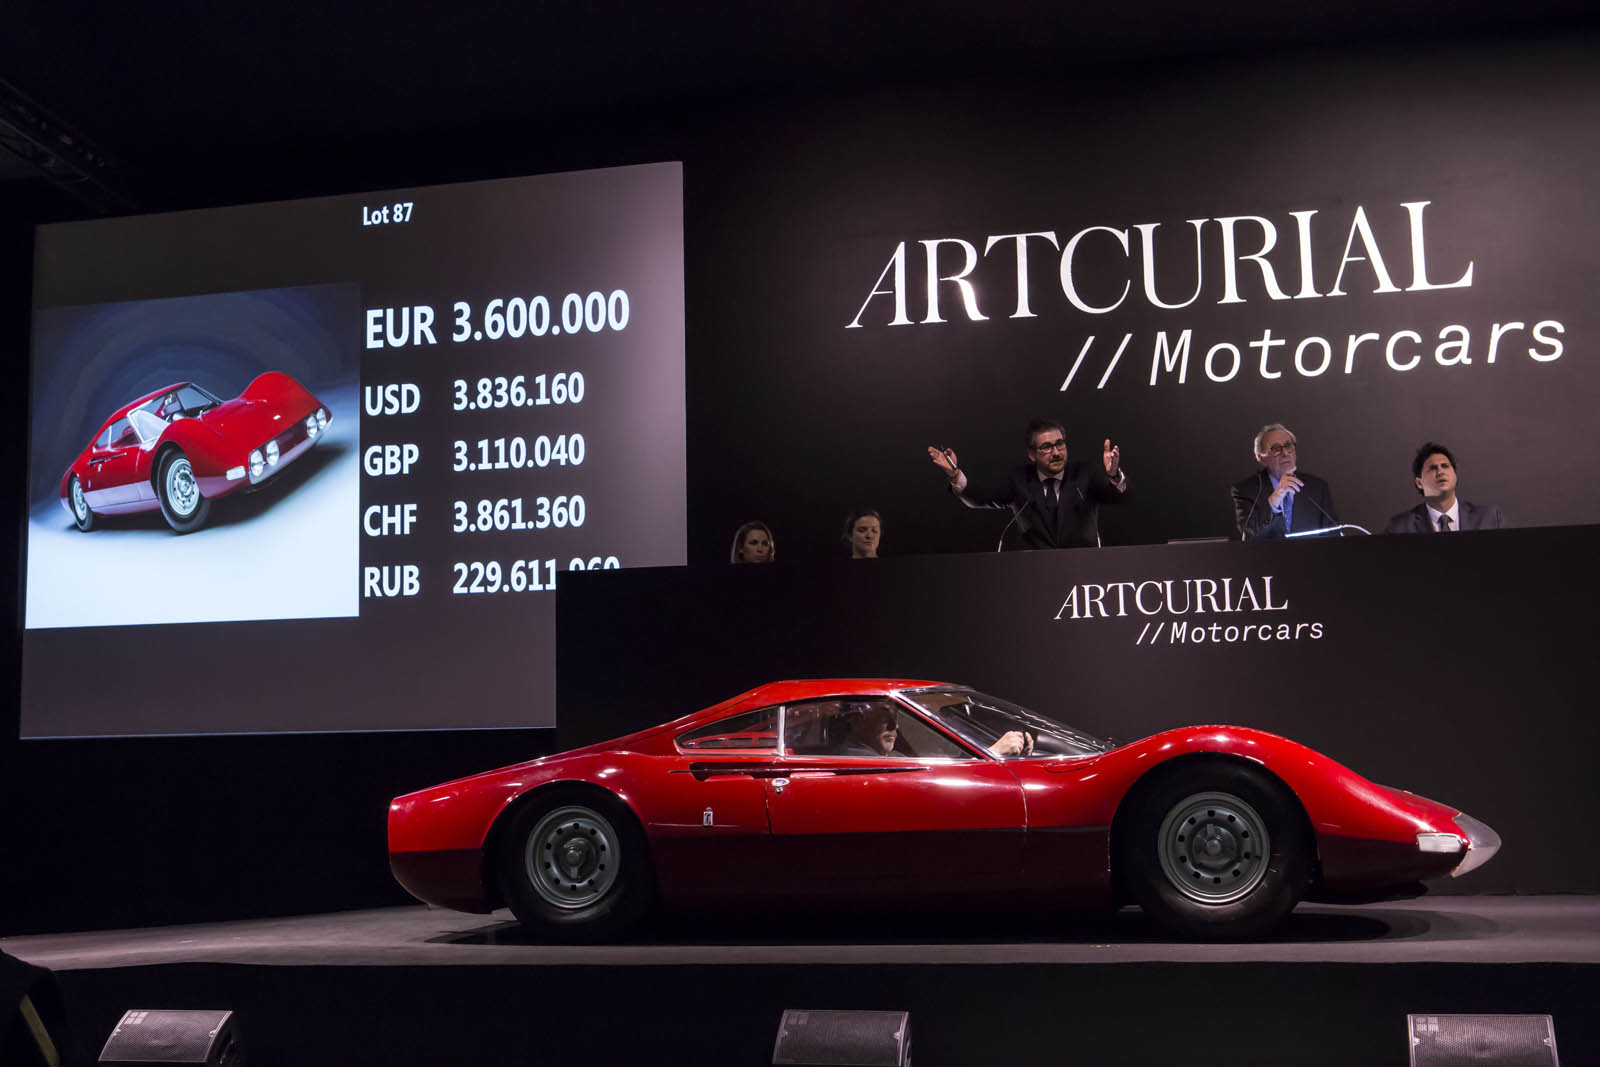 Lot+87+1966+Dino+206+P+Berlinetta+Speciale+%C2%A9Artcurial+copy